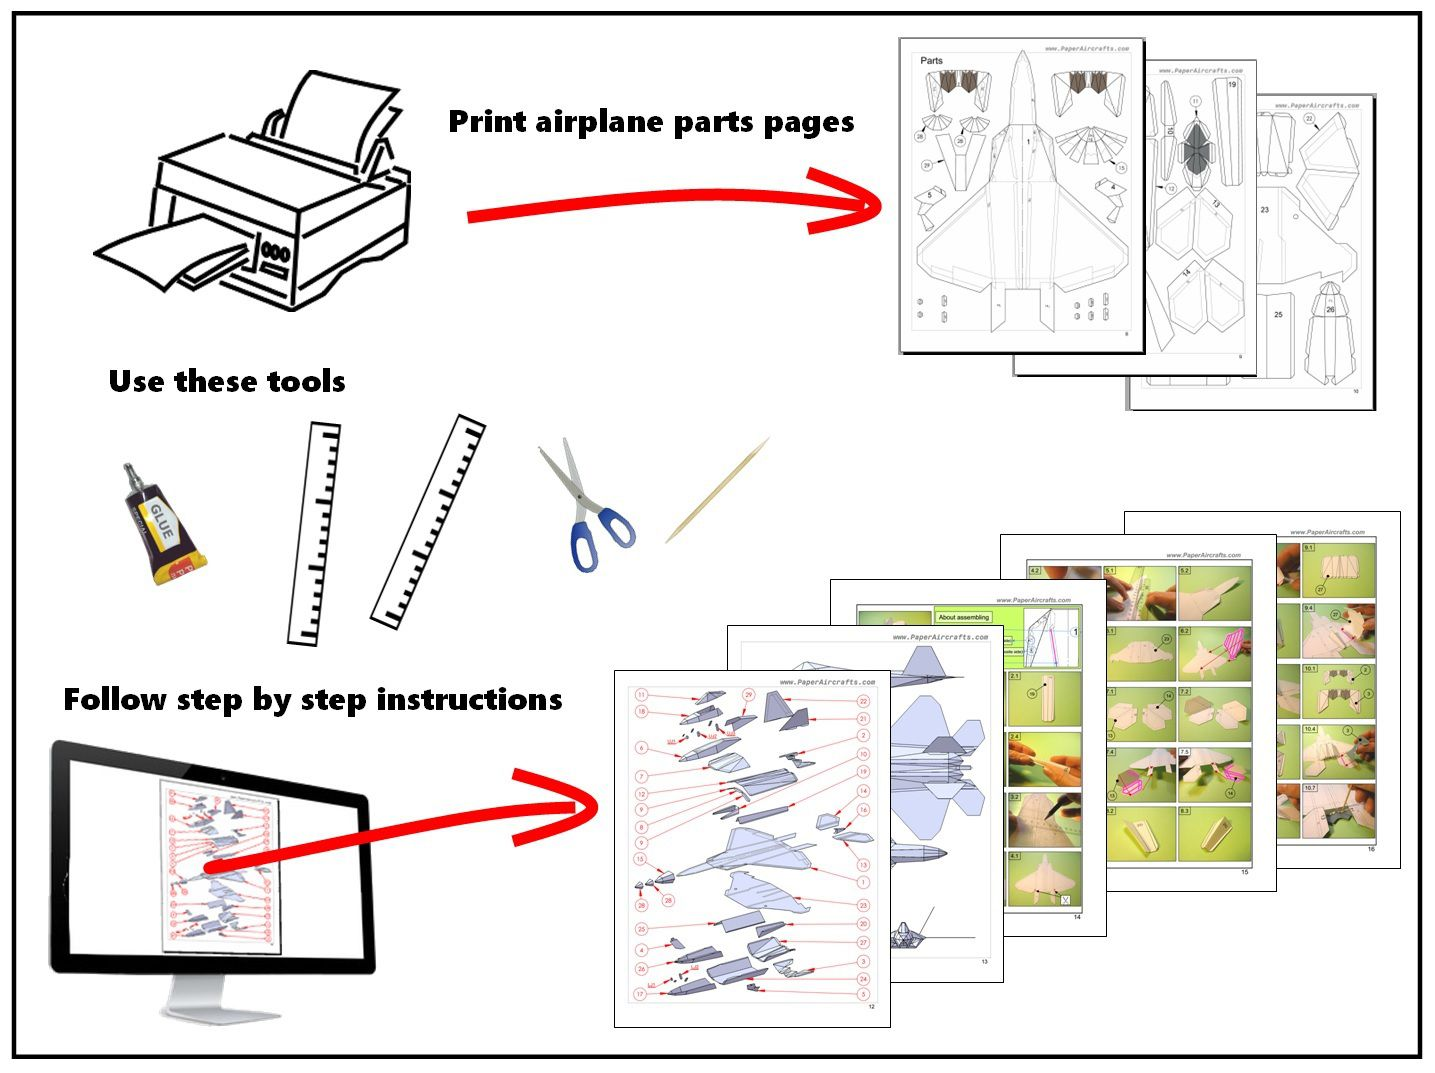 002 Wonderful Printable Paper Plane Plan Inspiration  Plans Airplane Free Design InstructionFull